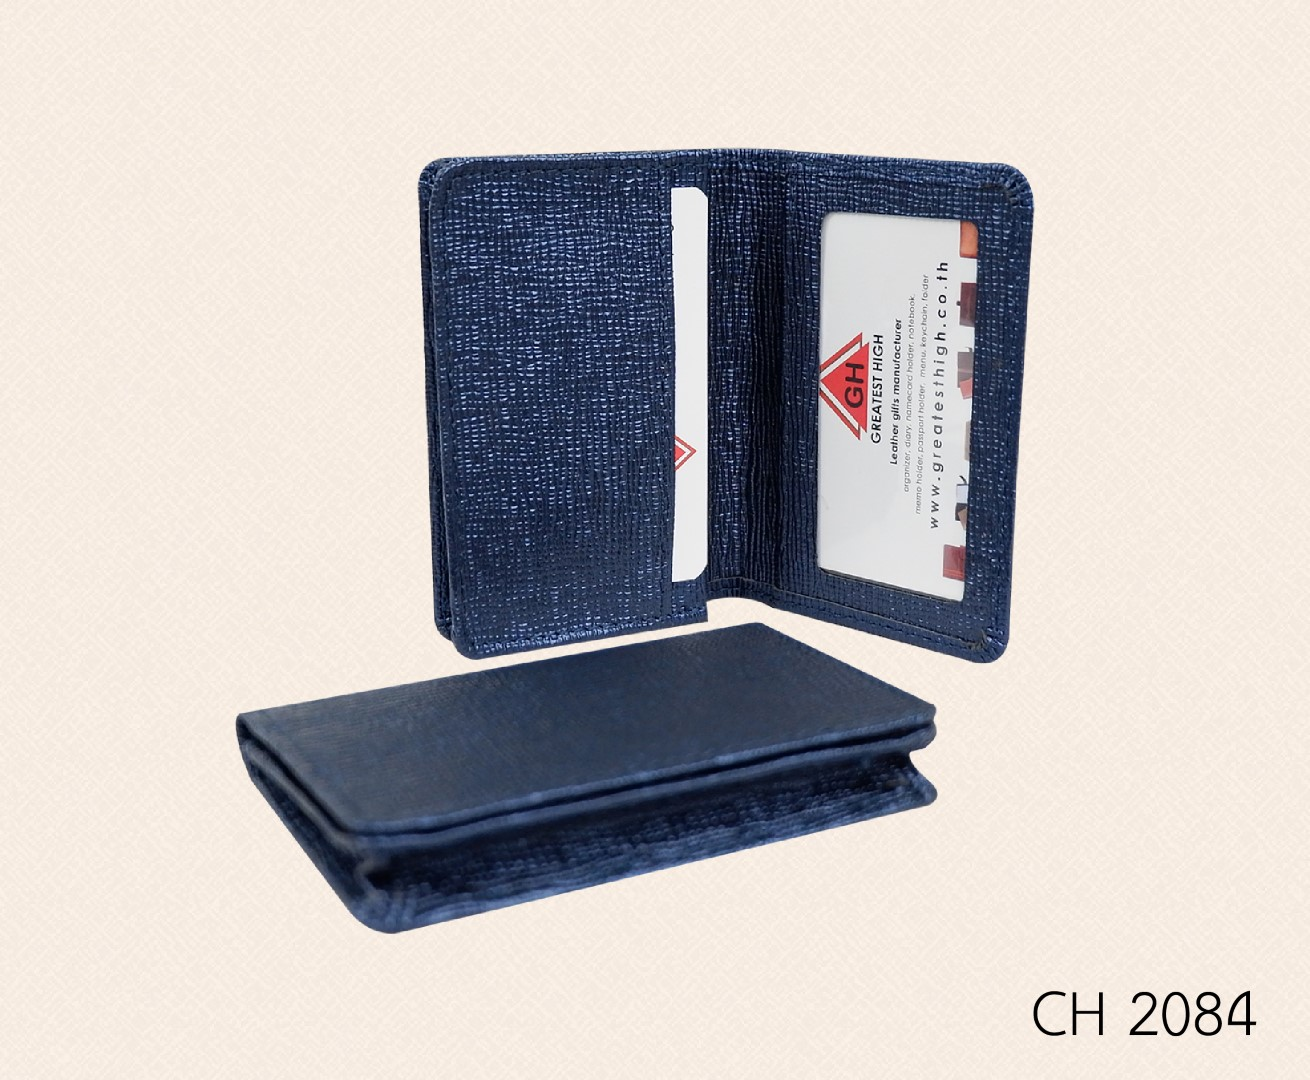 Card holder ที่ใส่บัตร 2084 (Large)